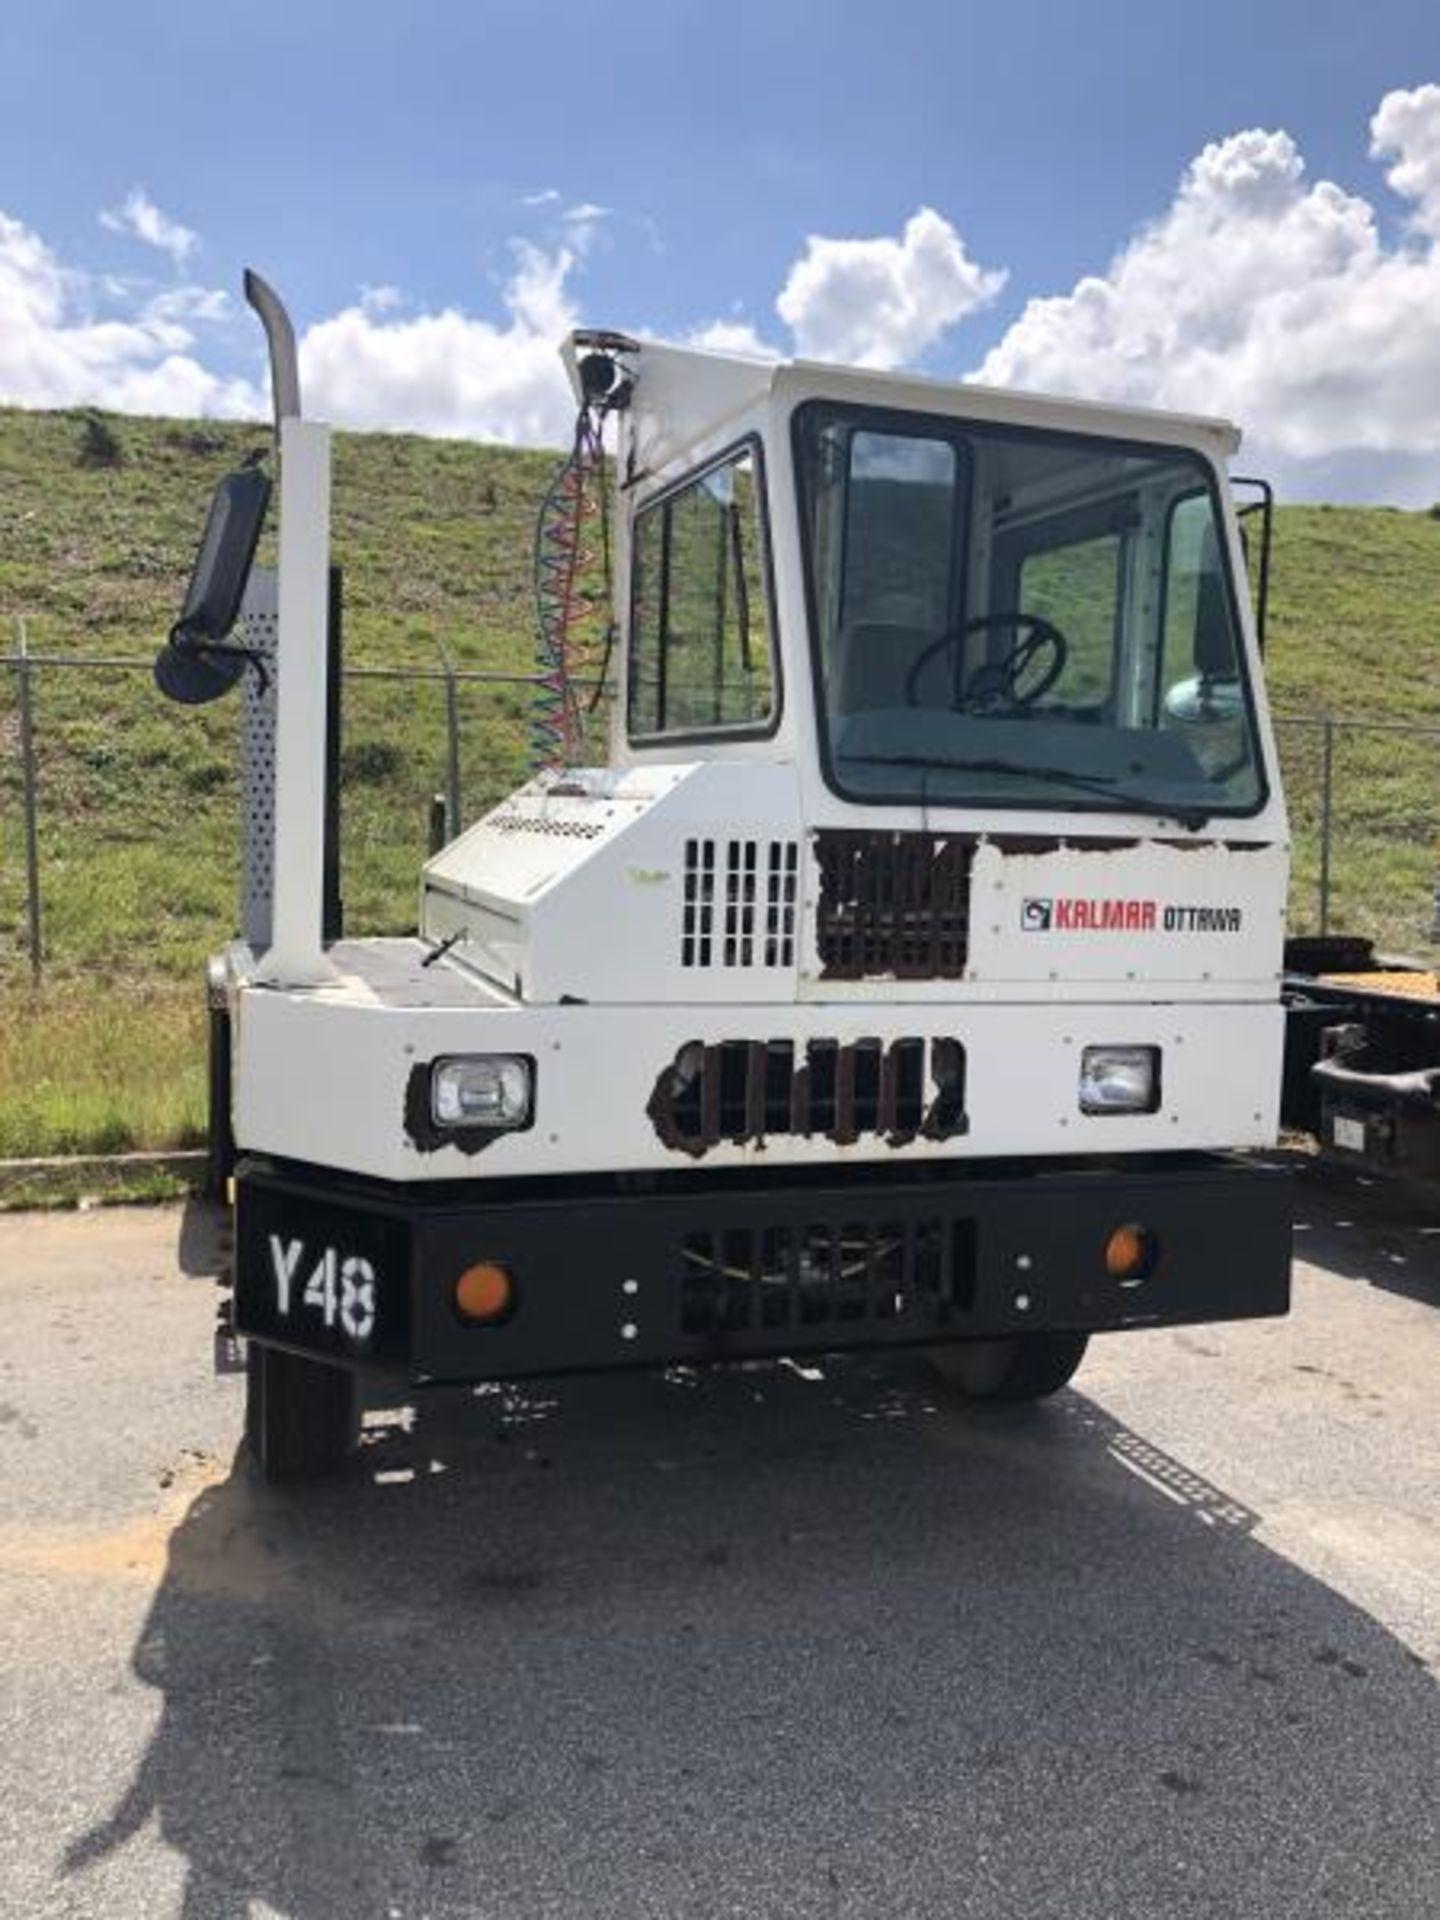 2015 Kalmar Ottawa 4x2 Yard Truck , SN: 338842 1,308.2 Hours, 937 Miles - Image 17 of 27